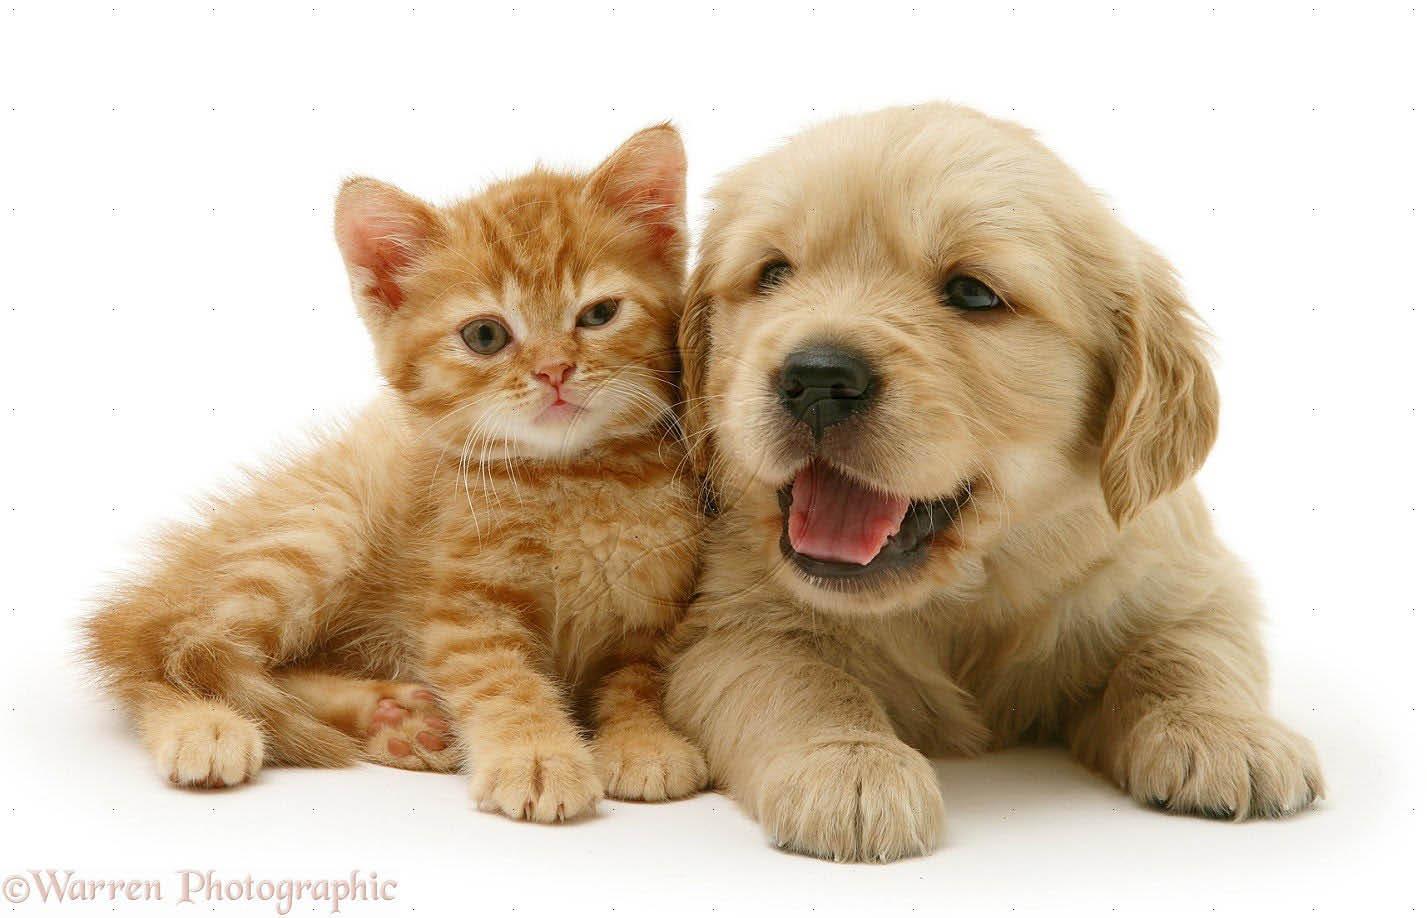 Pet Supplies in Elizabeth, NJ - Whiteway Pet Shop Coupons - White Way Pet Store Coupons